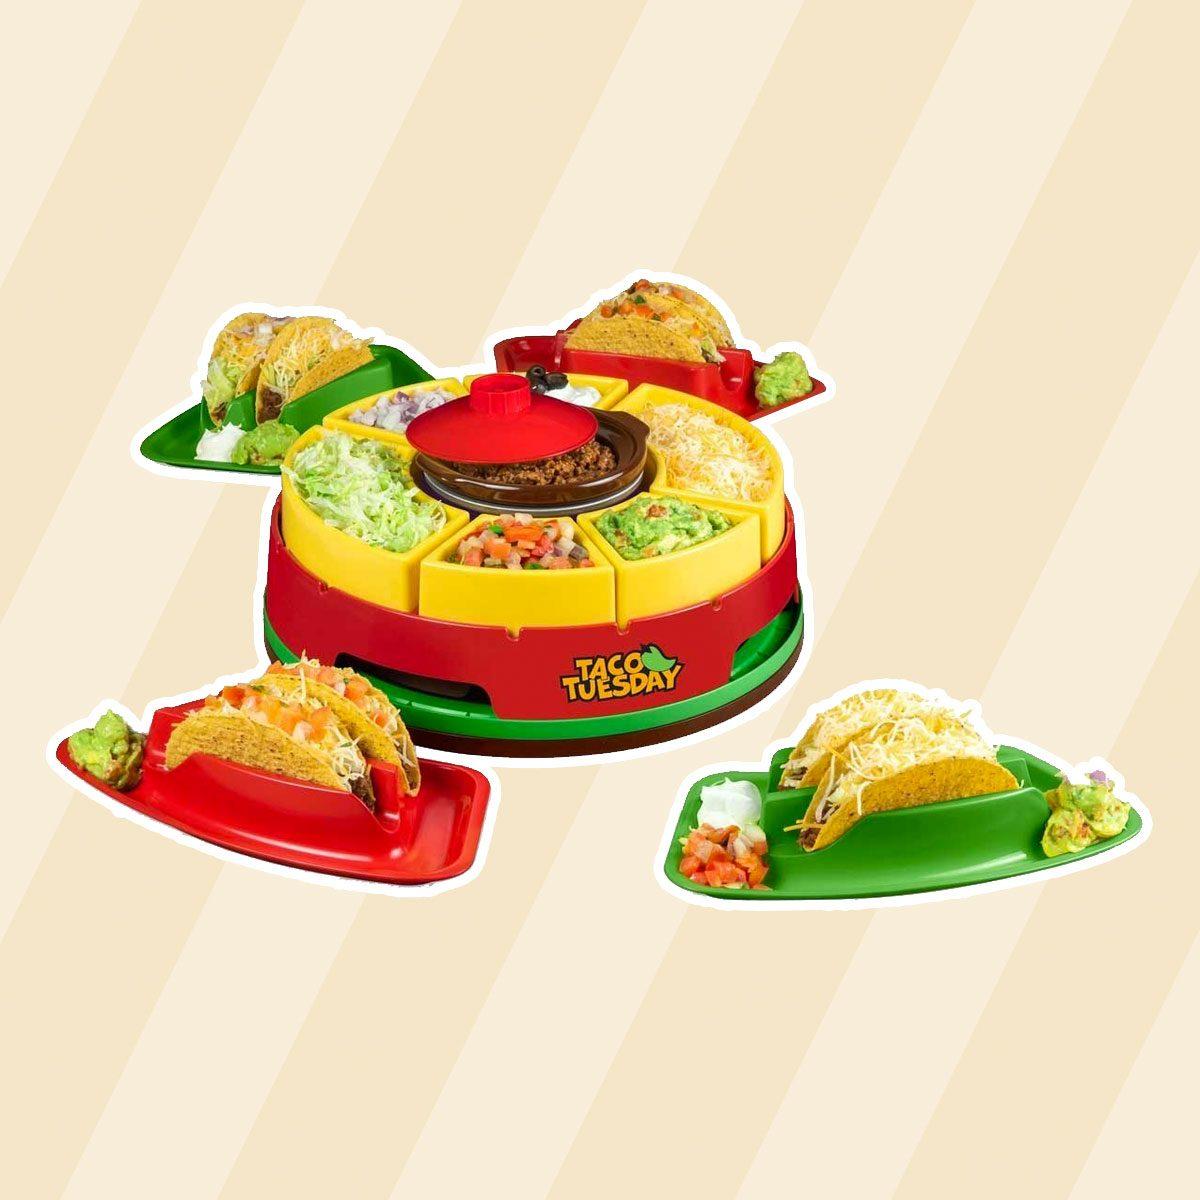 Nostalgia Taco Tuesday Heated Lazy Susan Topping Bar